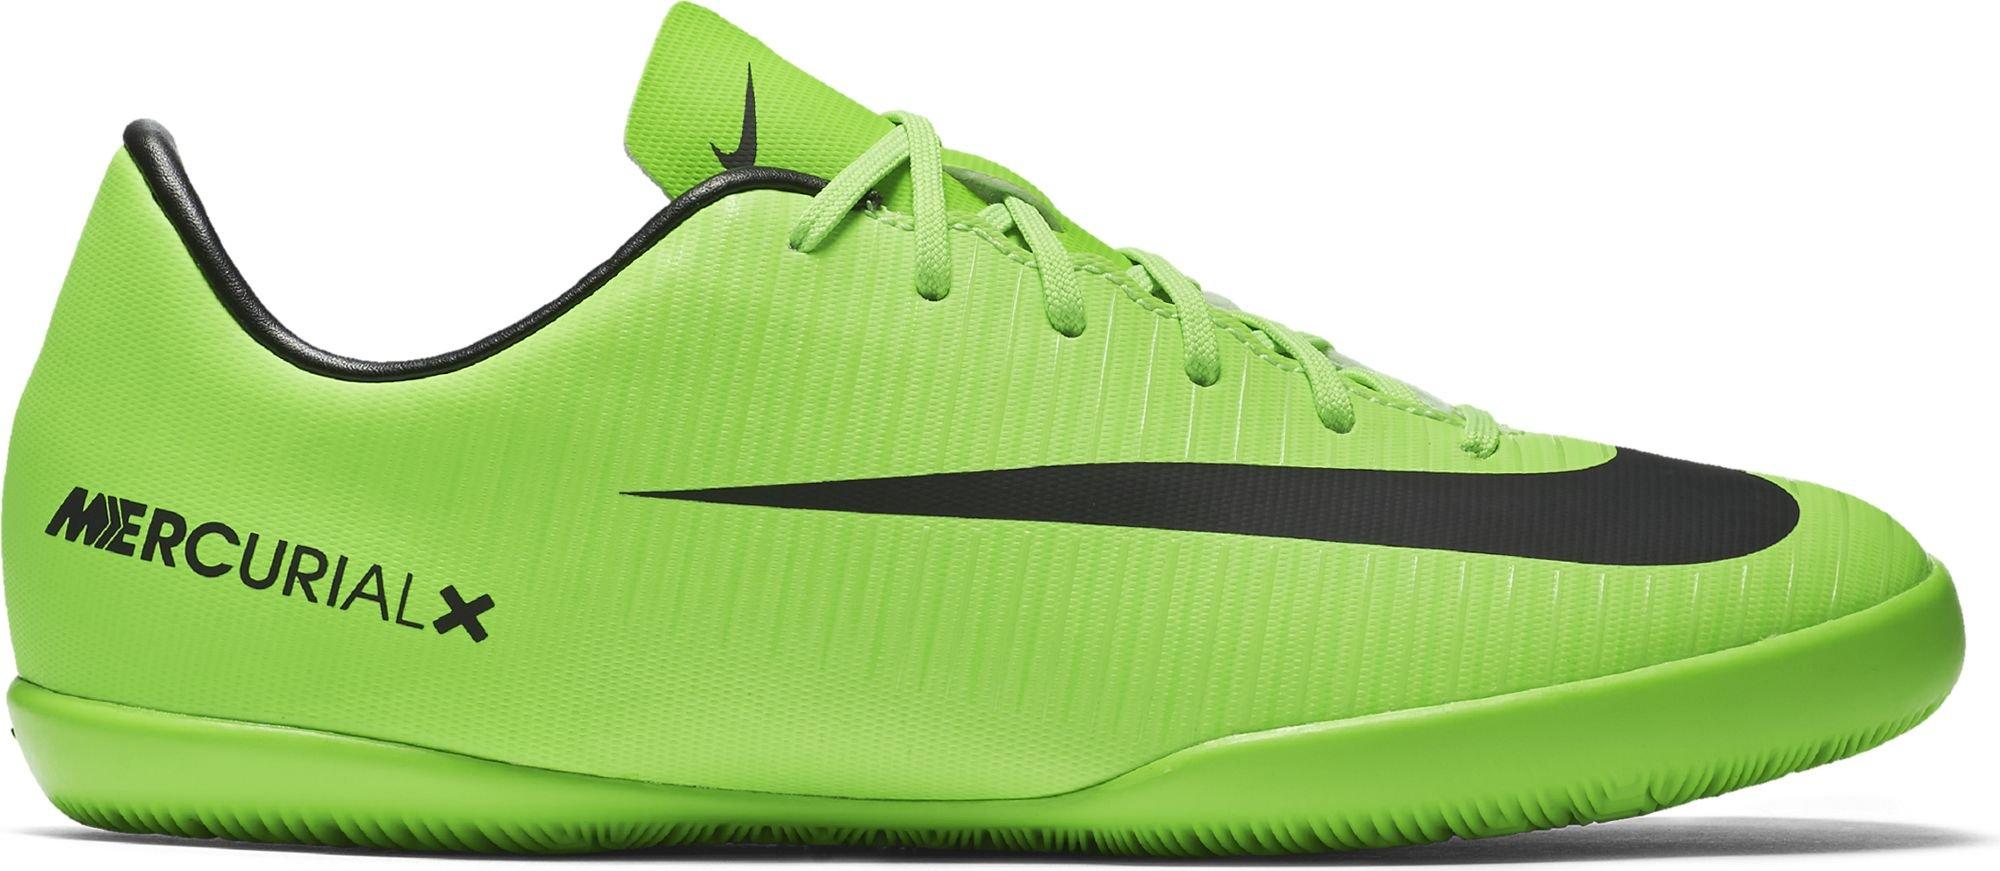 Nike Jr. Mercurial Victory VI IC Soccer Cleat (Electric Green), 5 Big Kids M by NIKE